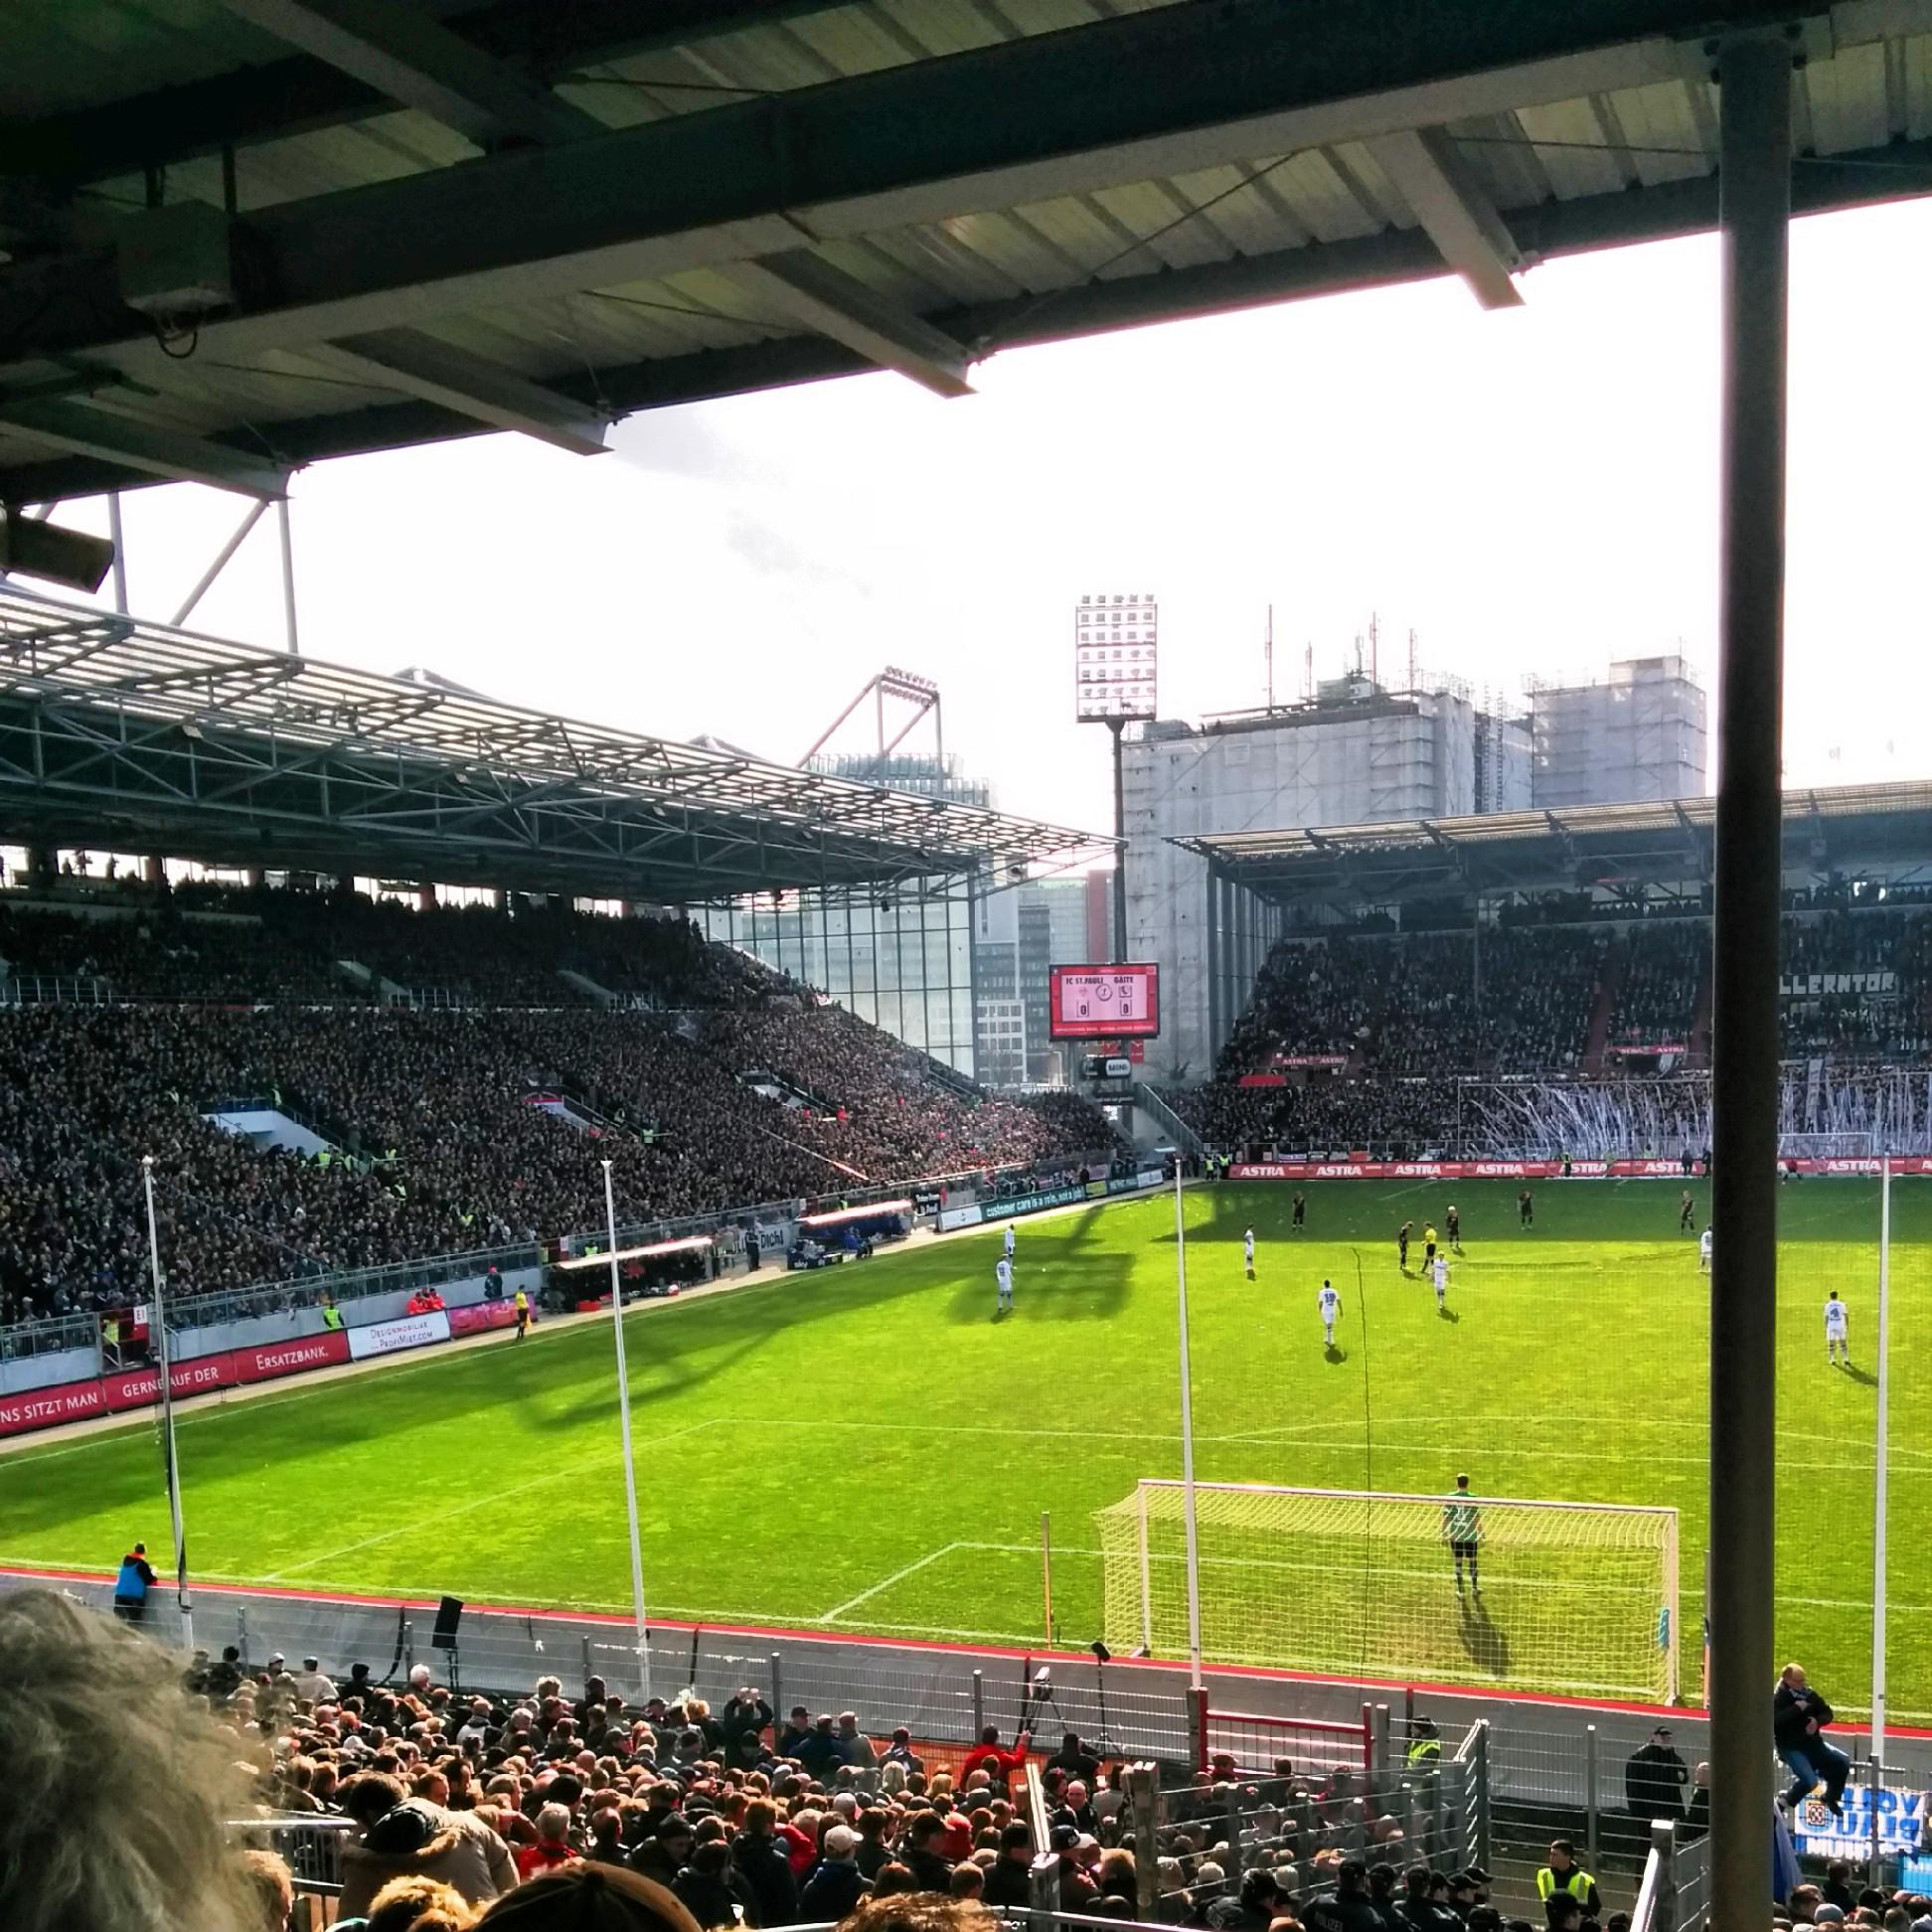 St. Pauli vs. VfL Bochum